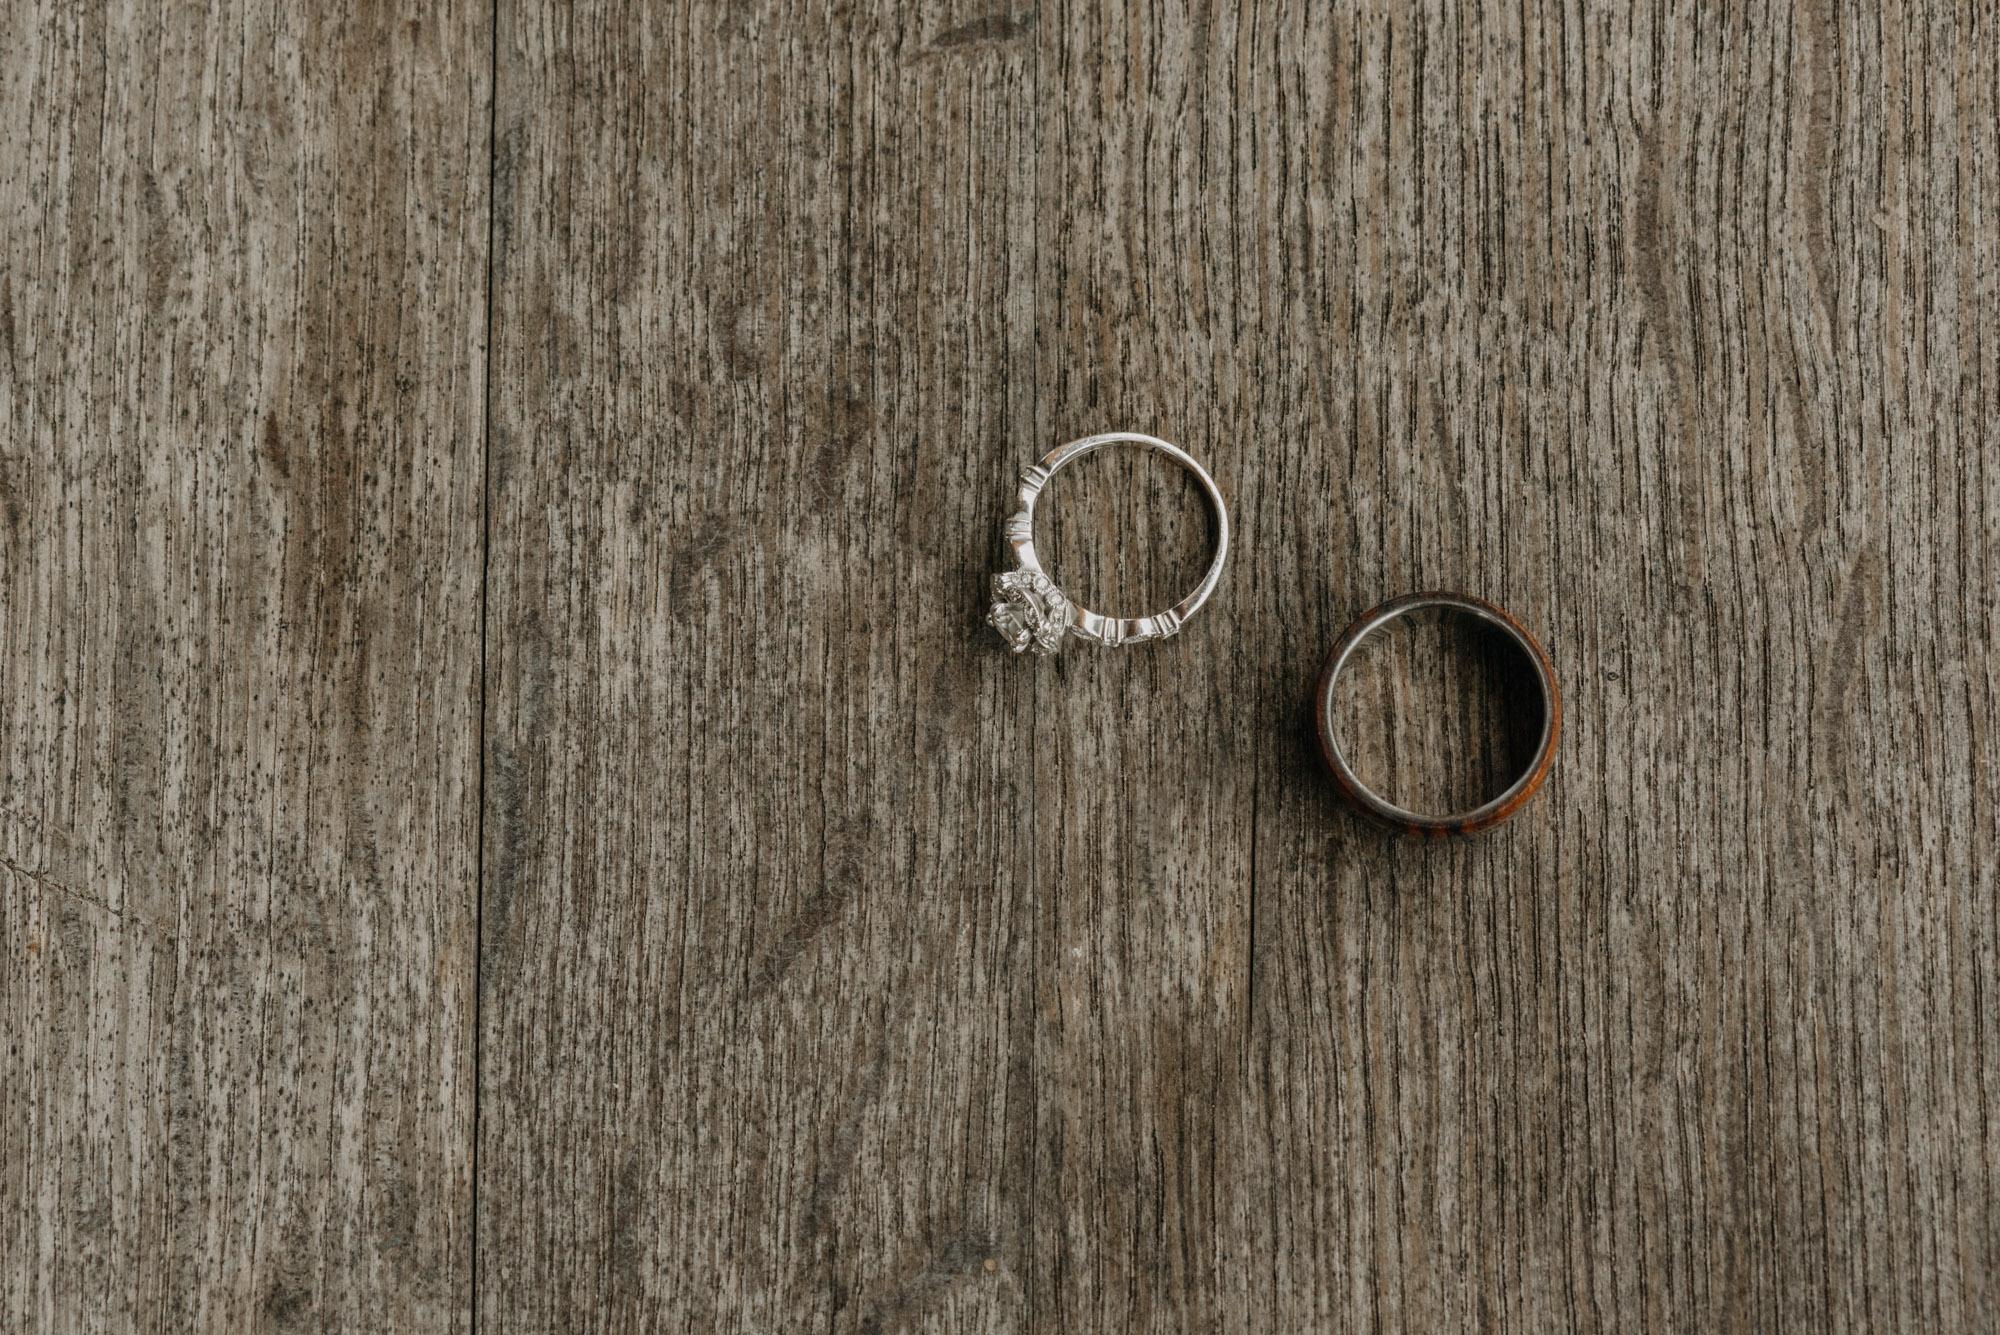 Getting-Ready-Swingset-Washington-Wedding-ringshot-7919.jpg